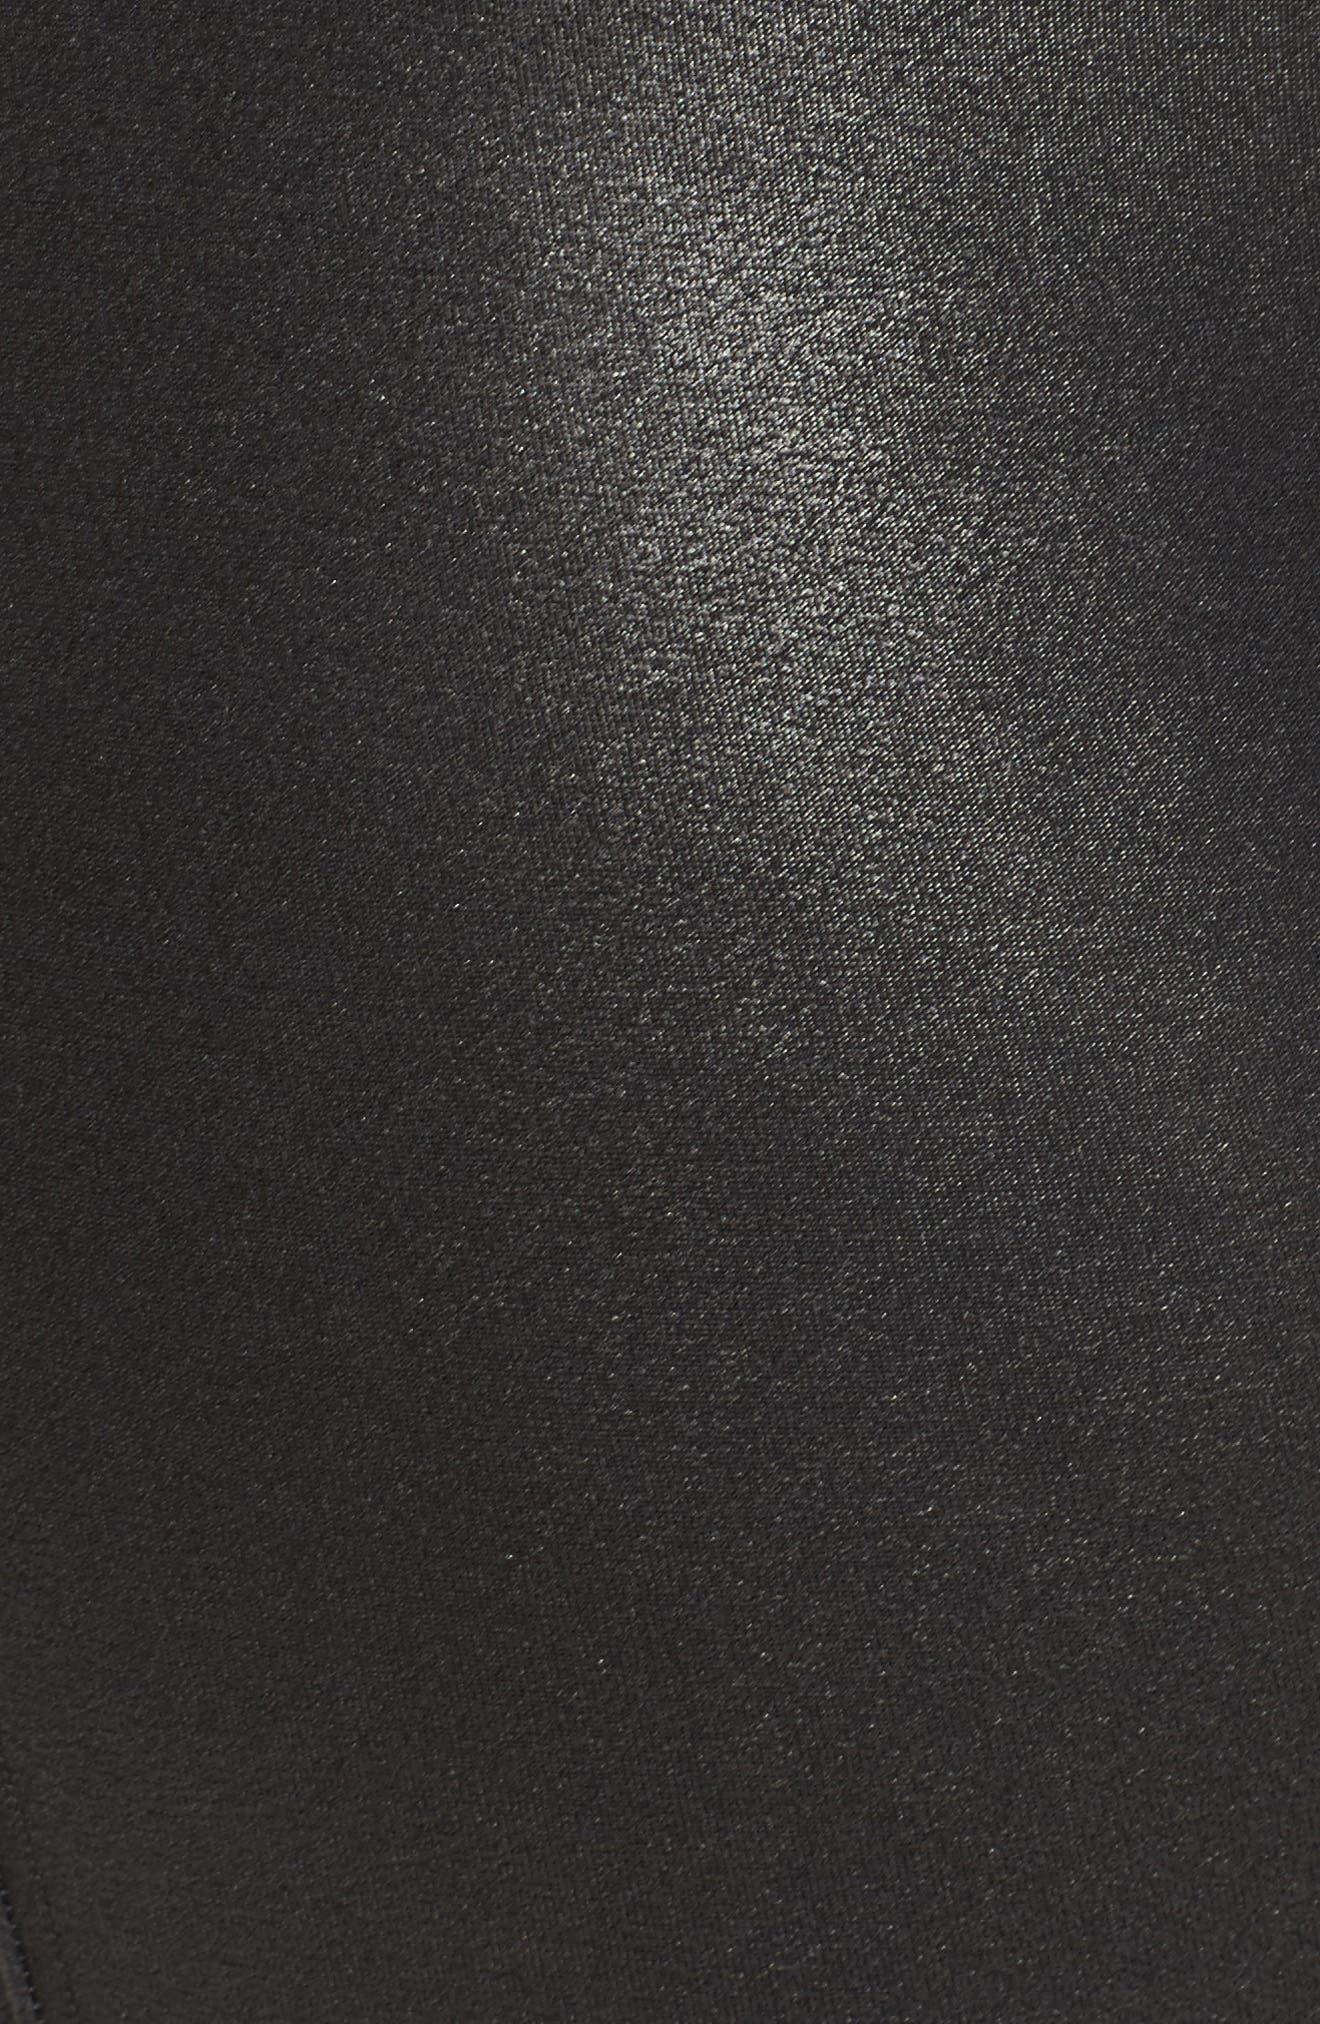 Faux Leather Leggings,                             Alternate thumbnail 7, color,                             BLACK